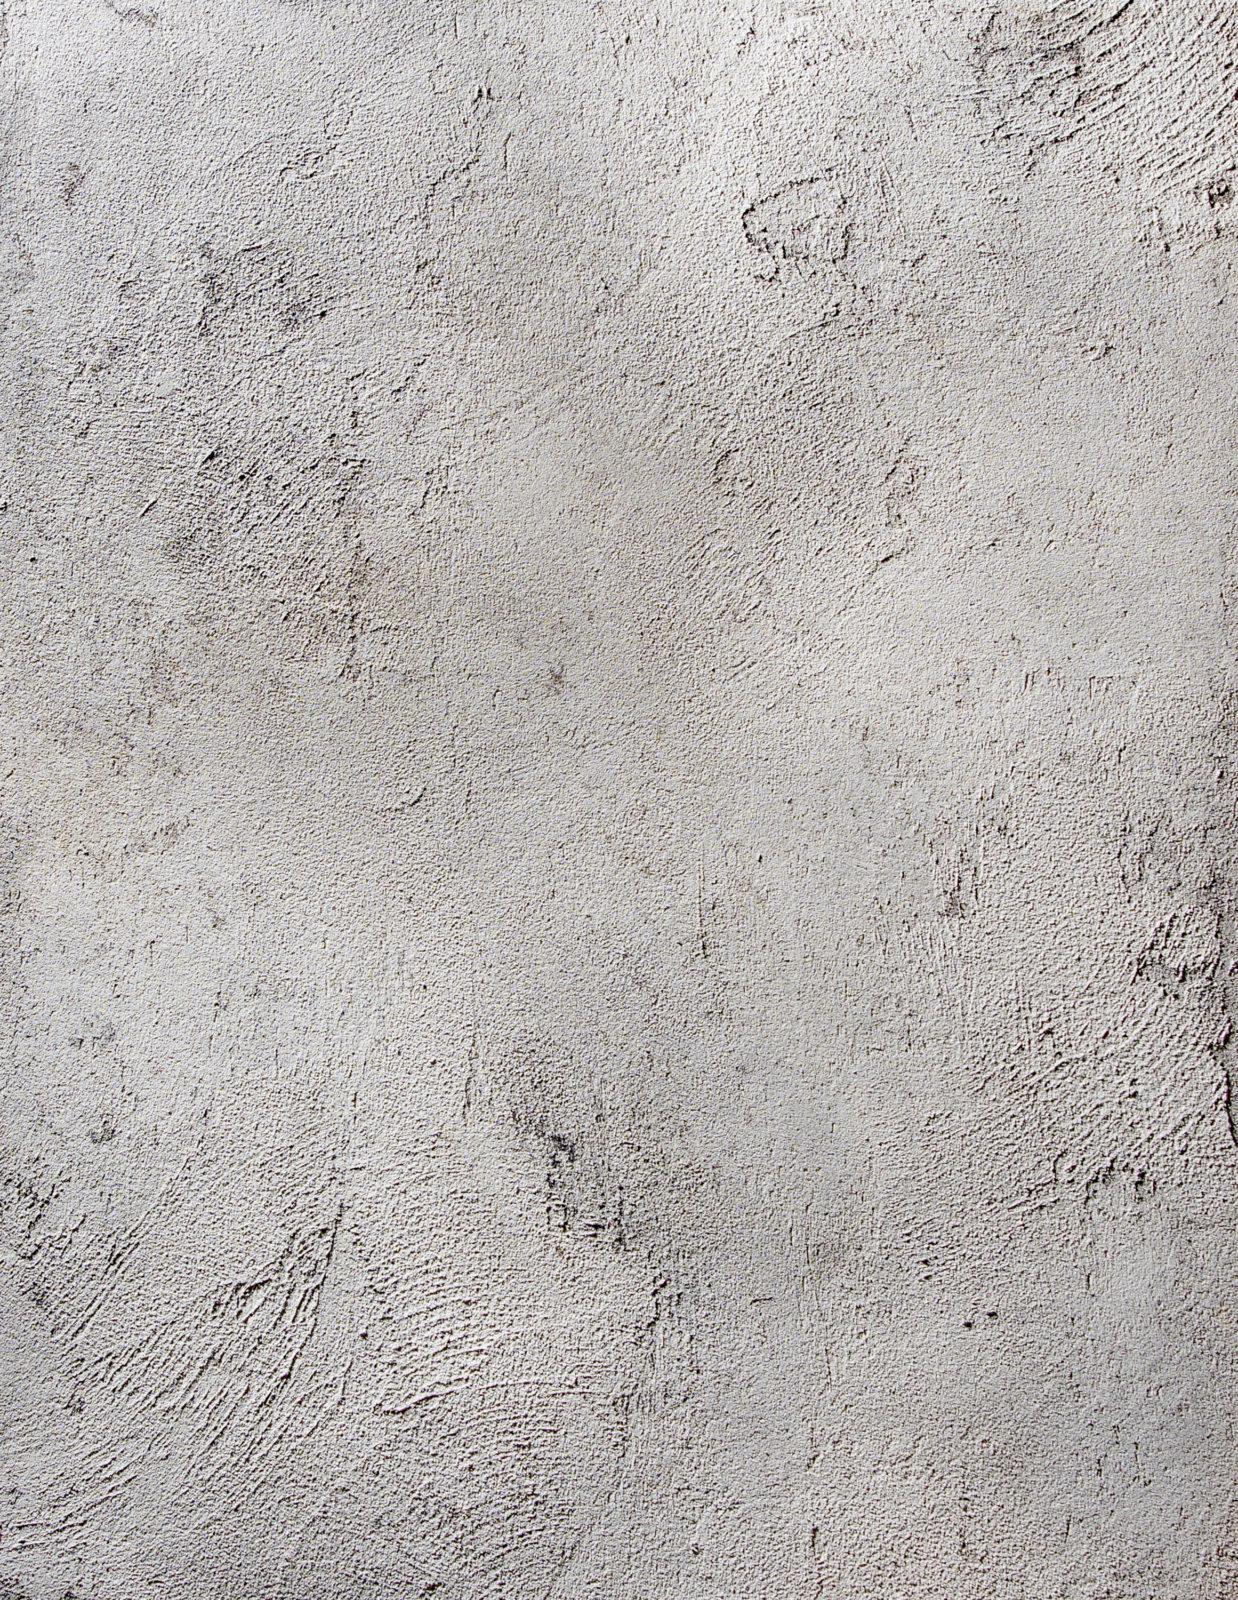 декоративная штукатурка под бетон фото фирмы каталоги